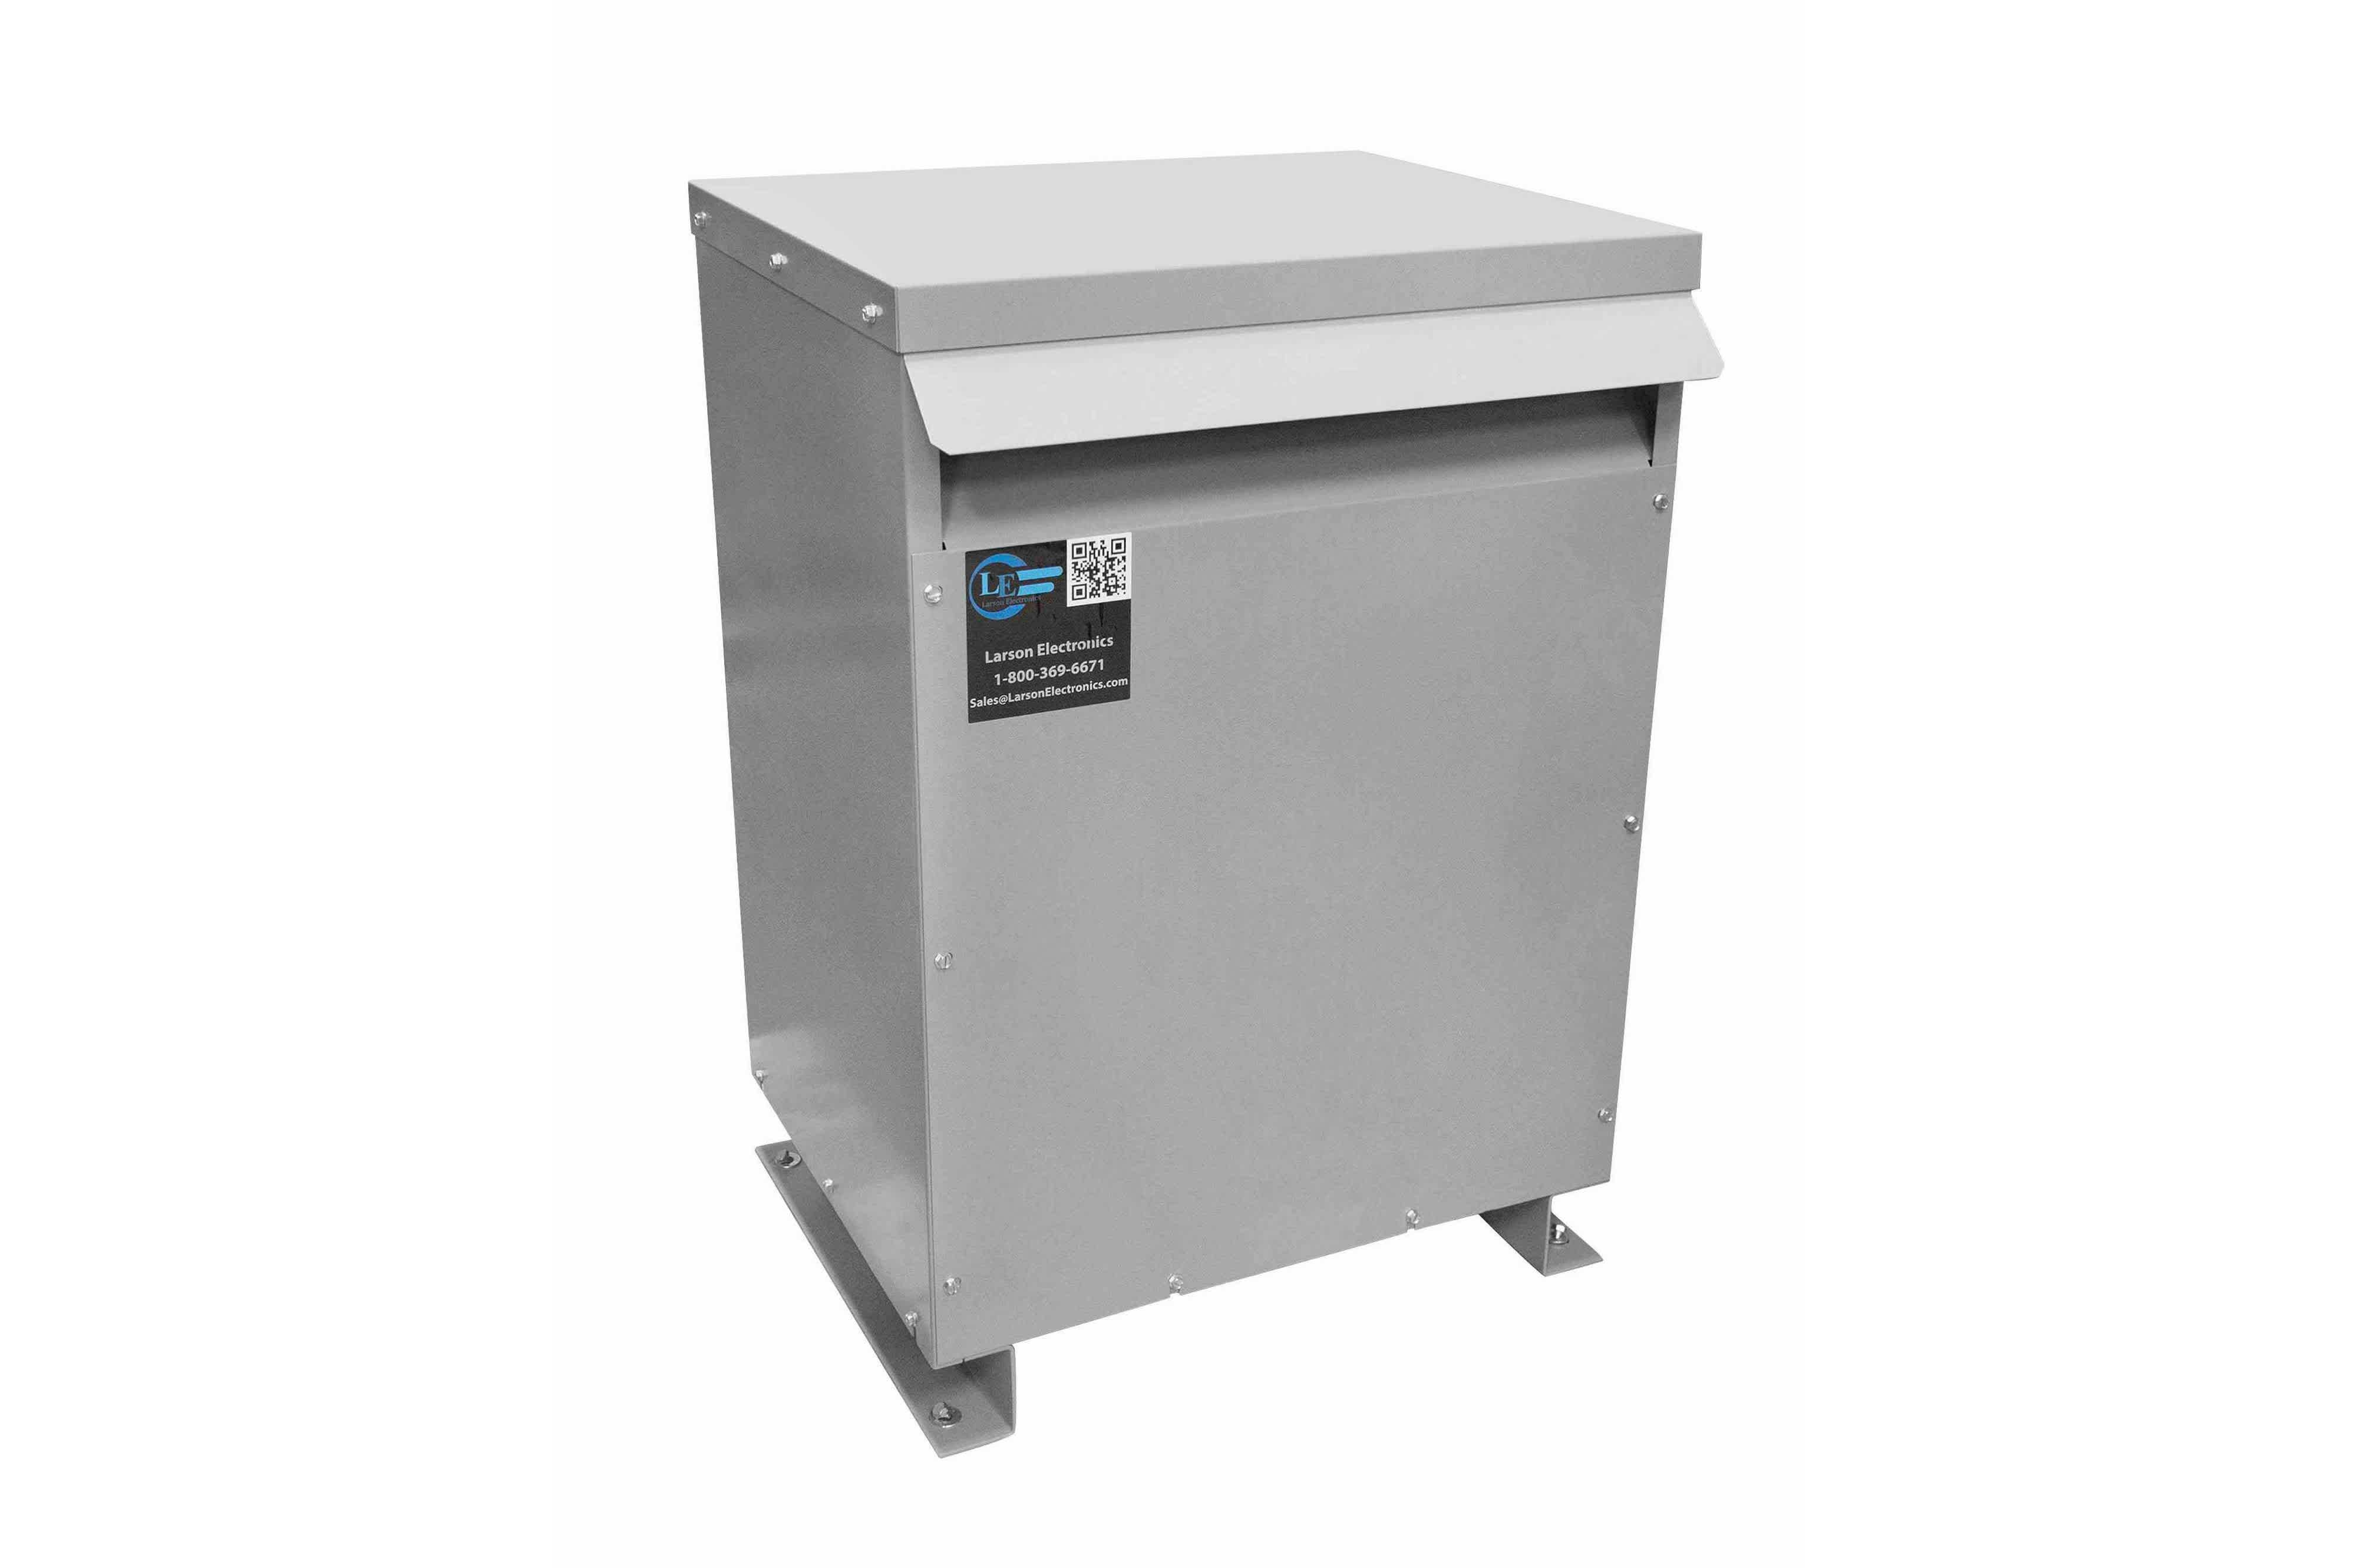 700 kVA 3PH Isolation Transformer, 208V Wye Primary, 208Y/120 Wye-N Secondary, N3R, Ventilated, 60 Hz